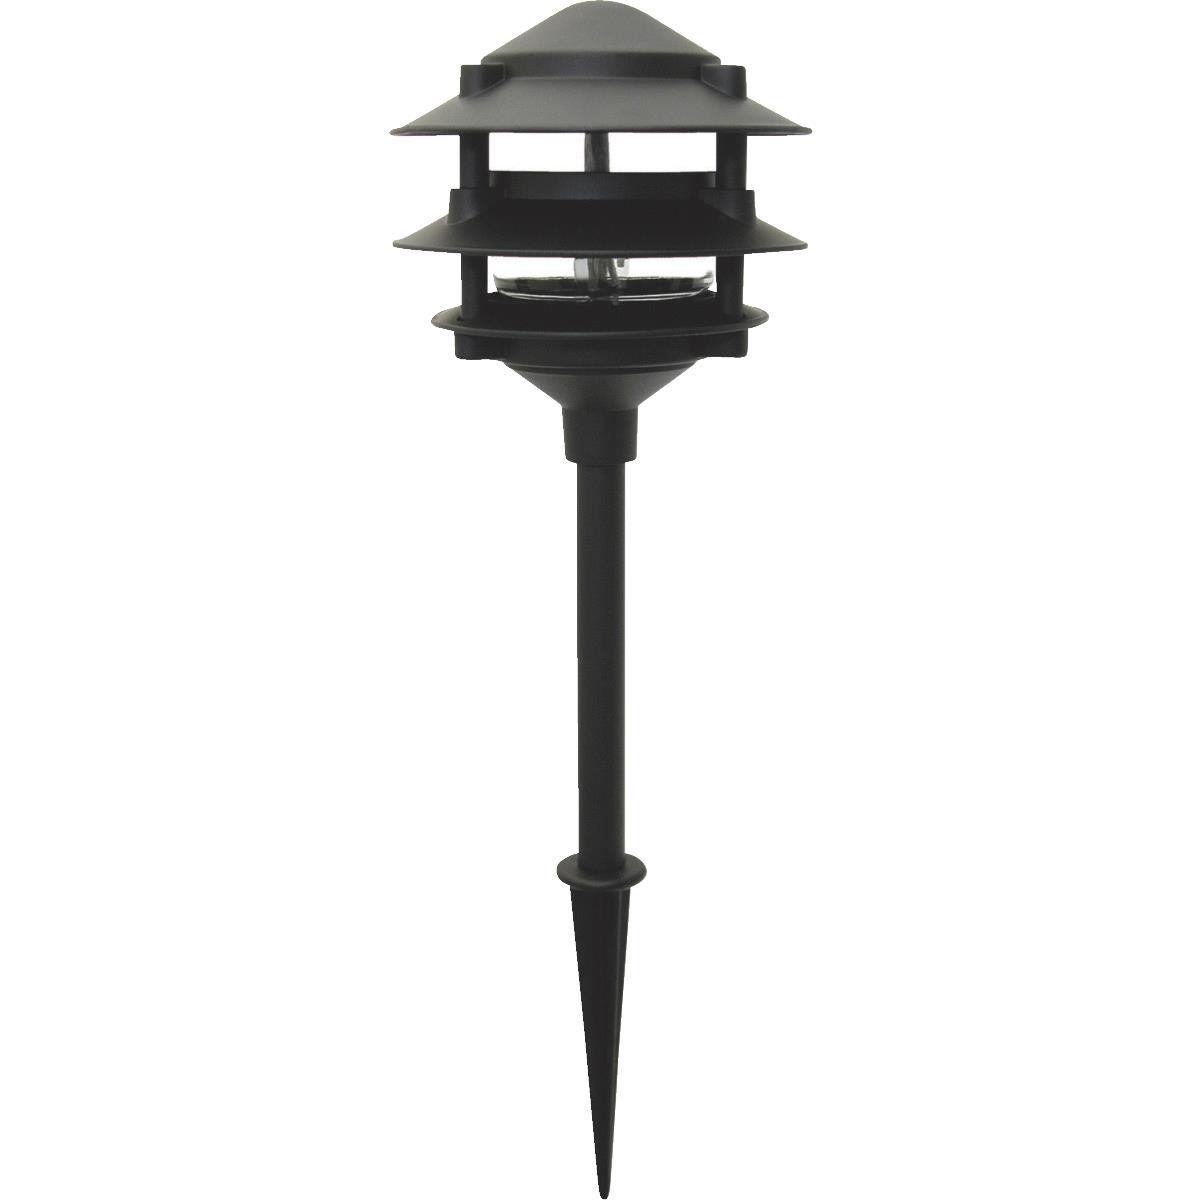 Landscape Lighting Supply: Buy Moonrays 3-Tier Landscape Stake Light Black